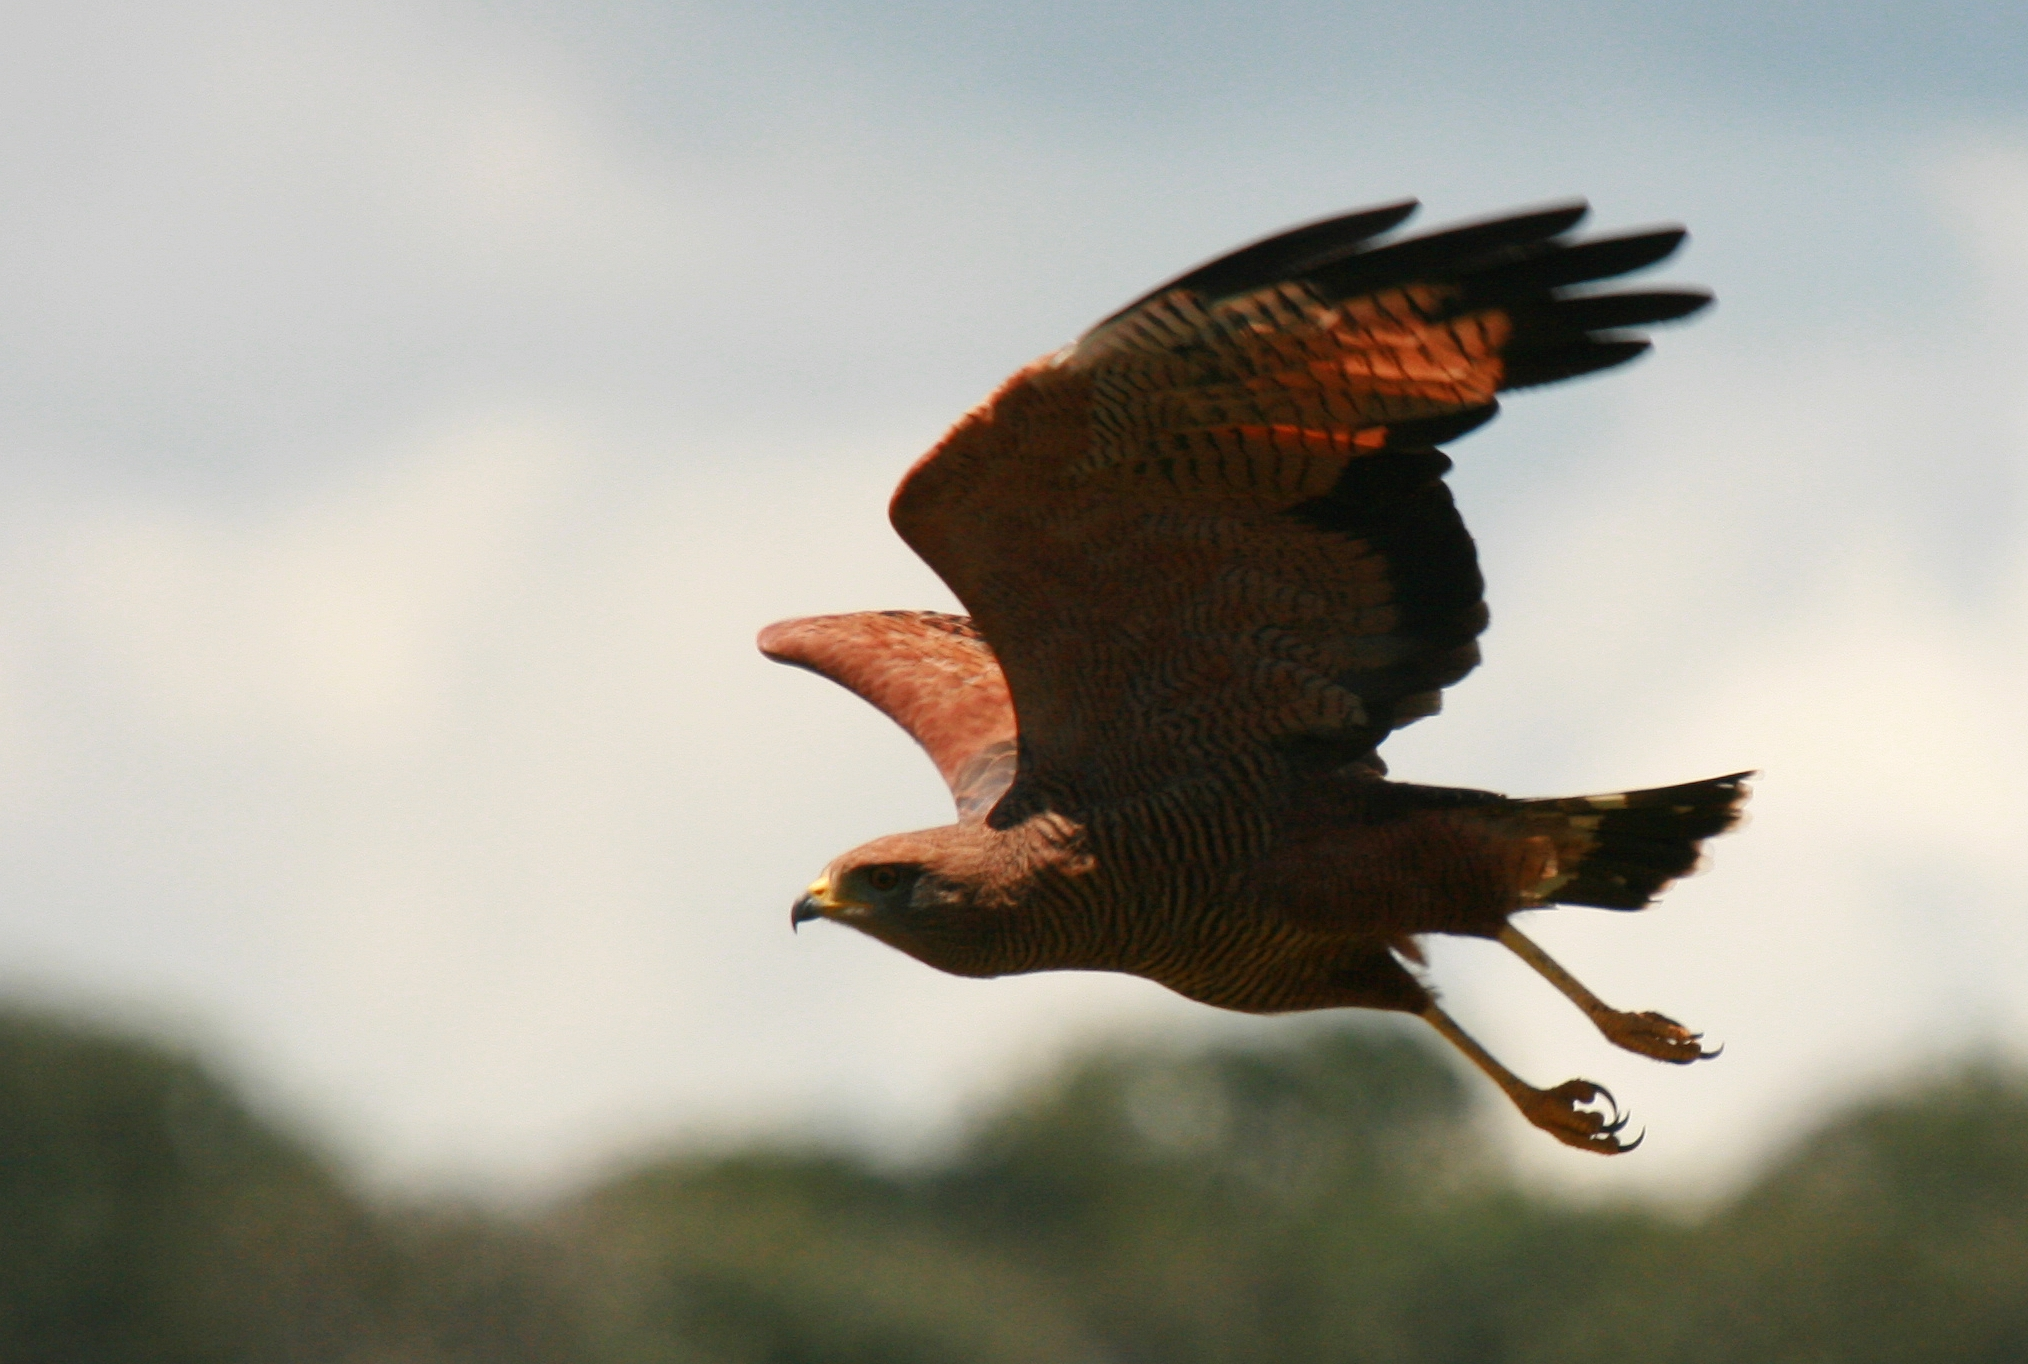 [Image: Buteogallus_meridionalis_-Goias%2C_Brazil_-flying-8.jpg]